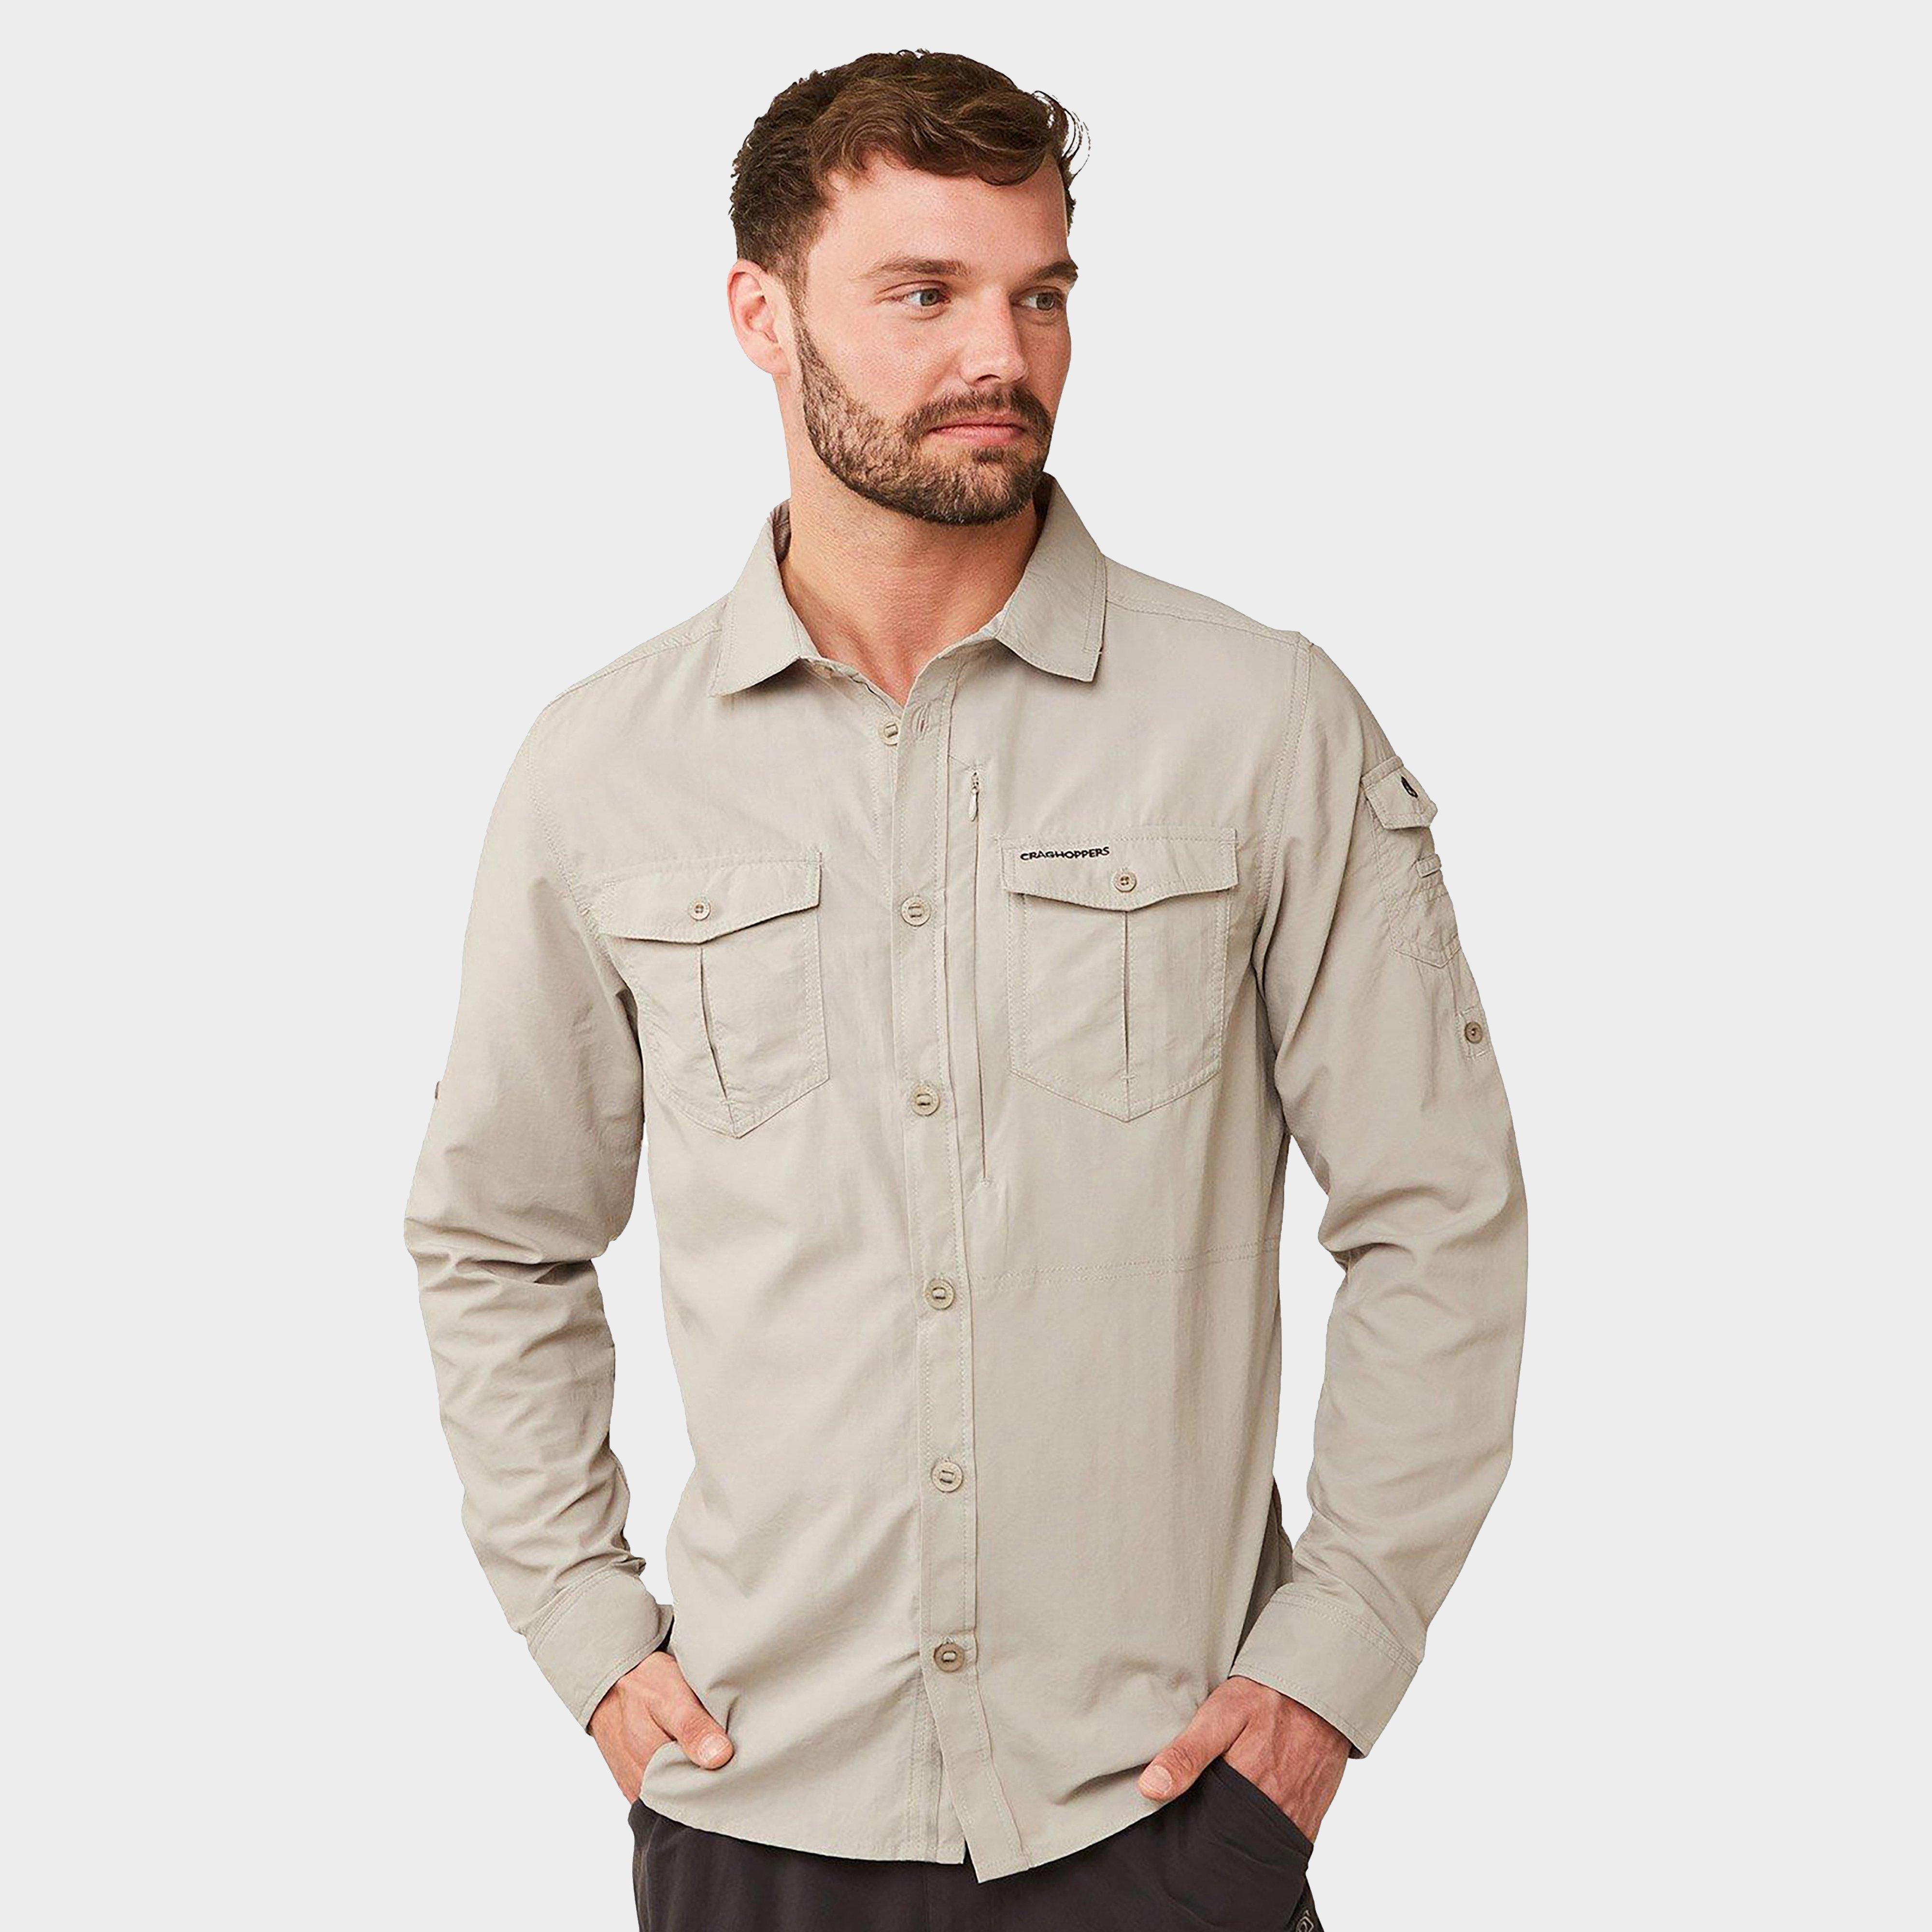 Craghoppers Craghoppers Mens NosiLife Adventure II Long Sleeve Shirt - Beige, Beige